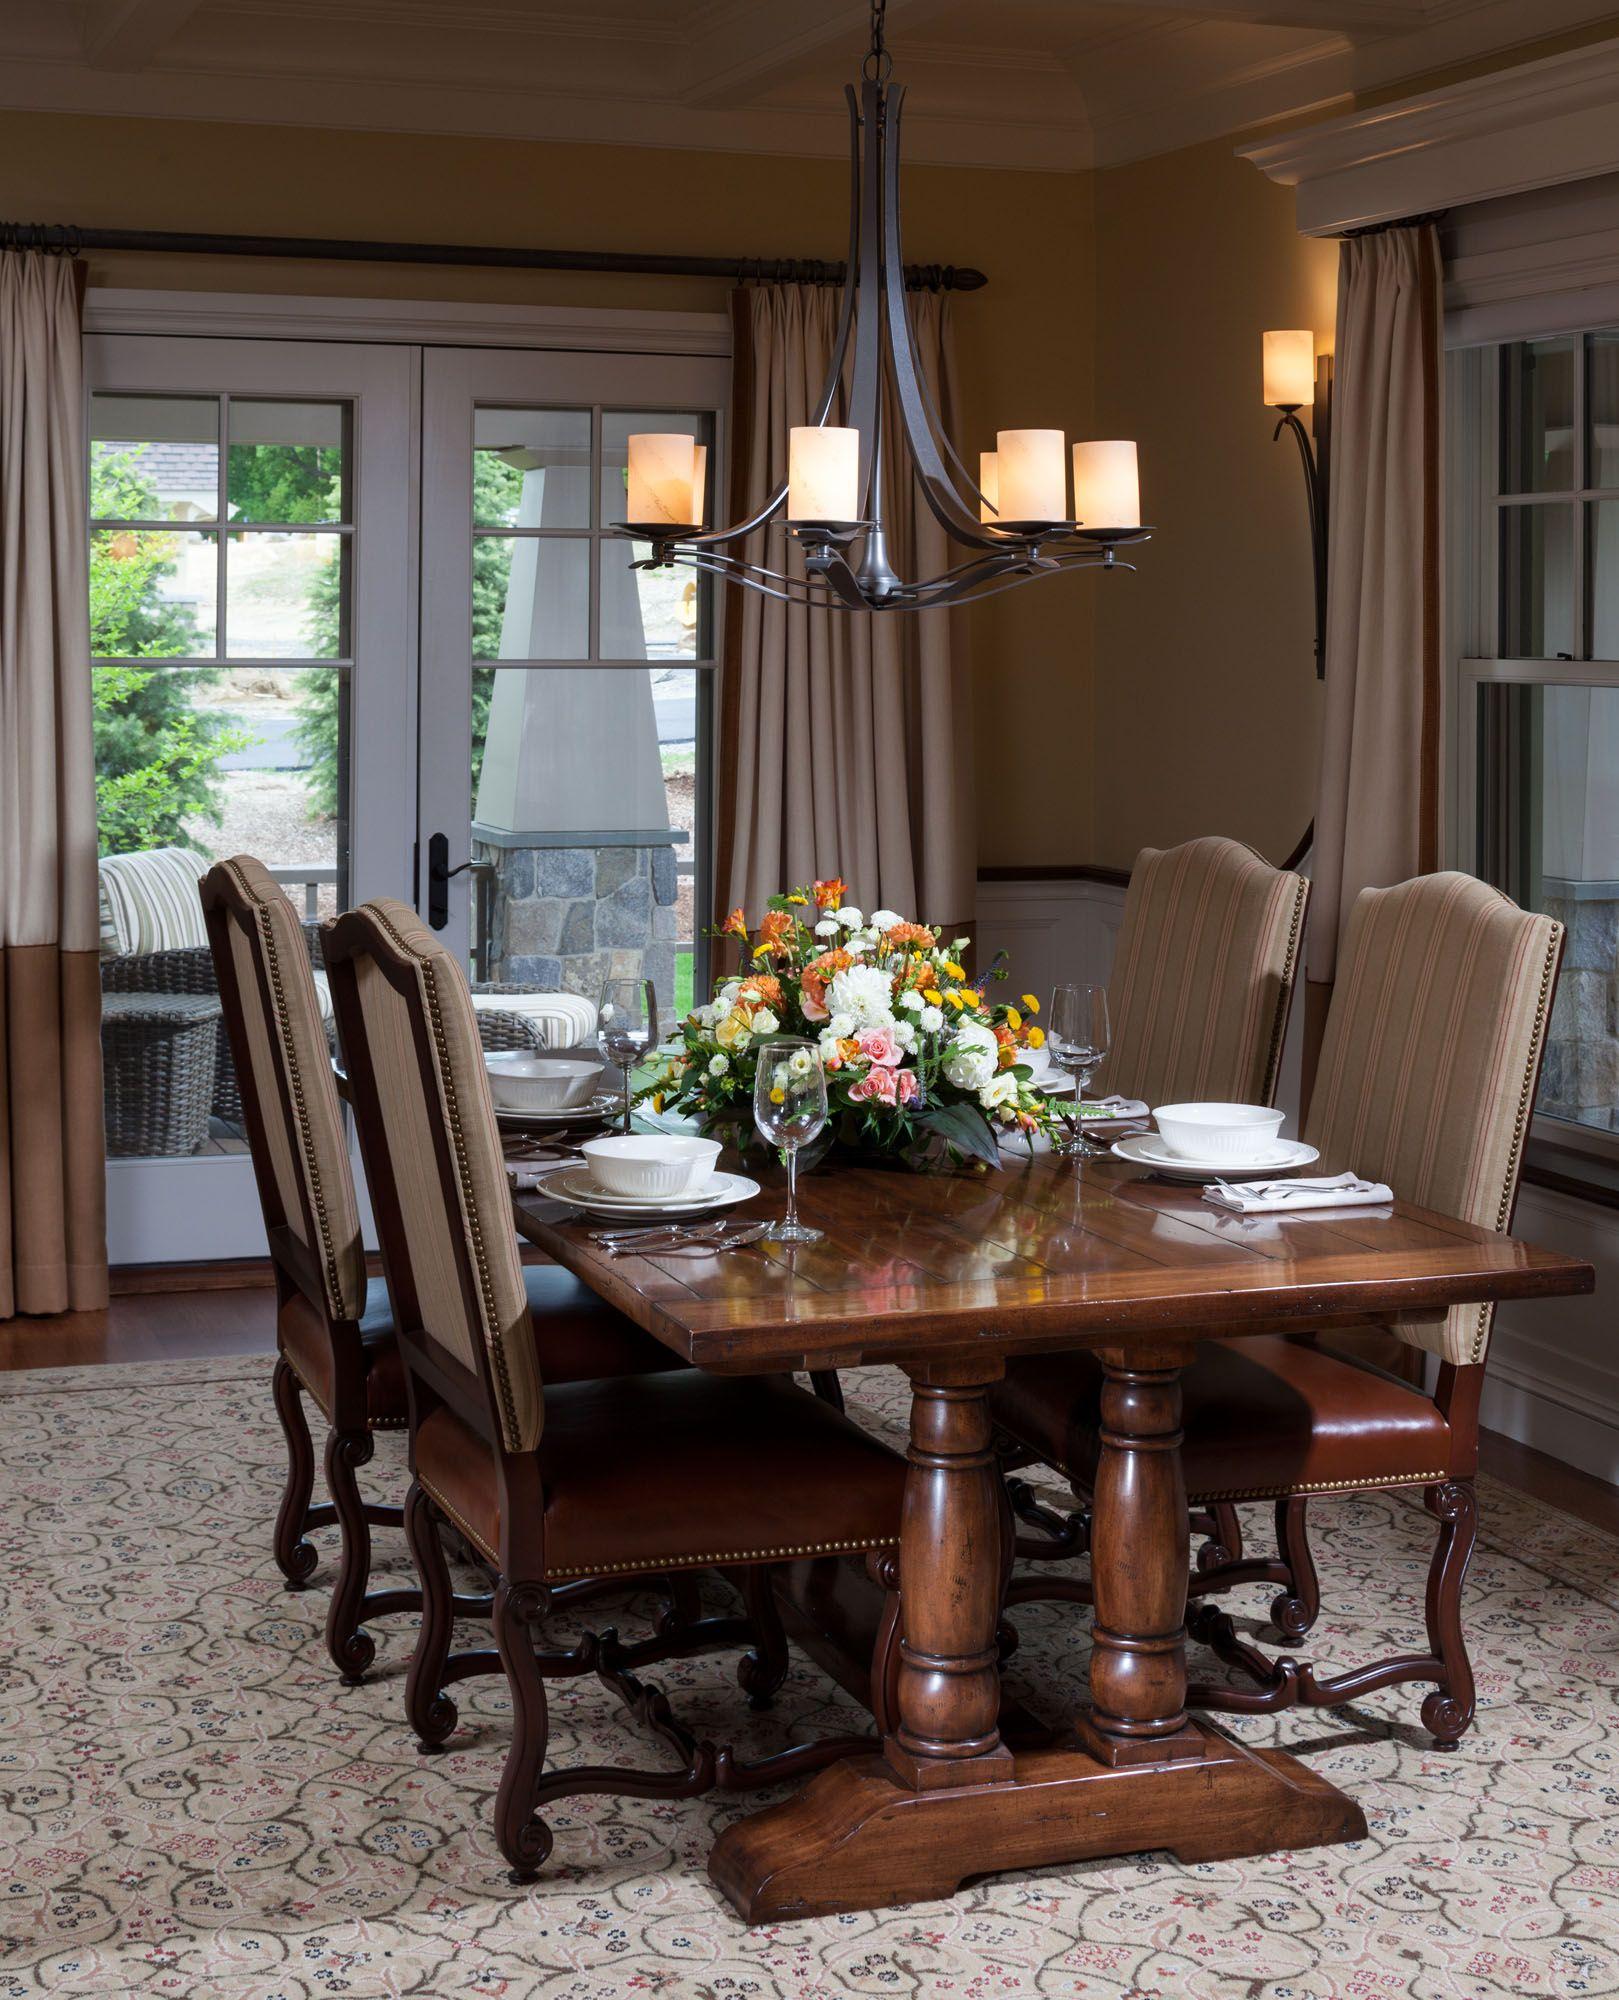 CEBULA DESIGN: Dining Room in Newbury, MA #cebuladesign #interiordesign #diningroom